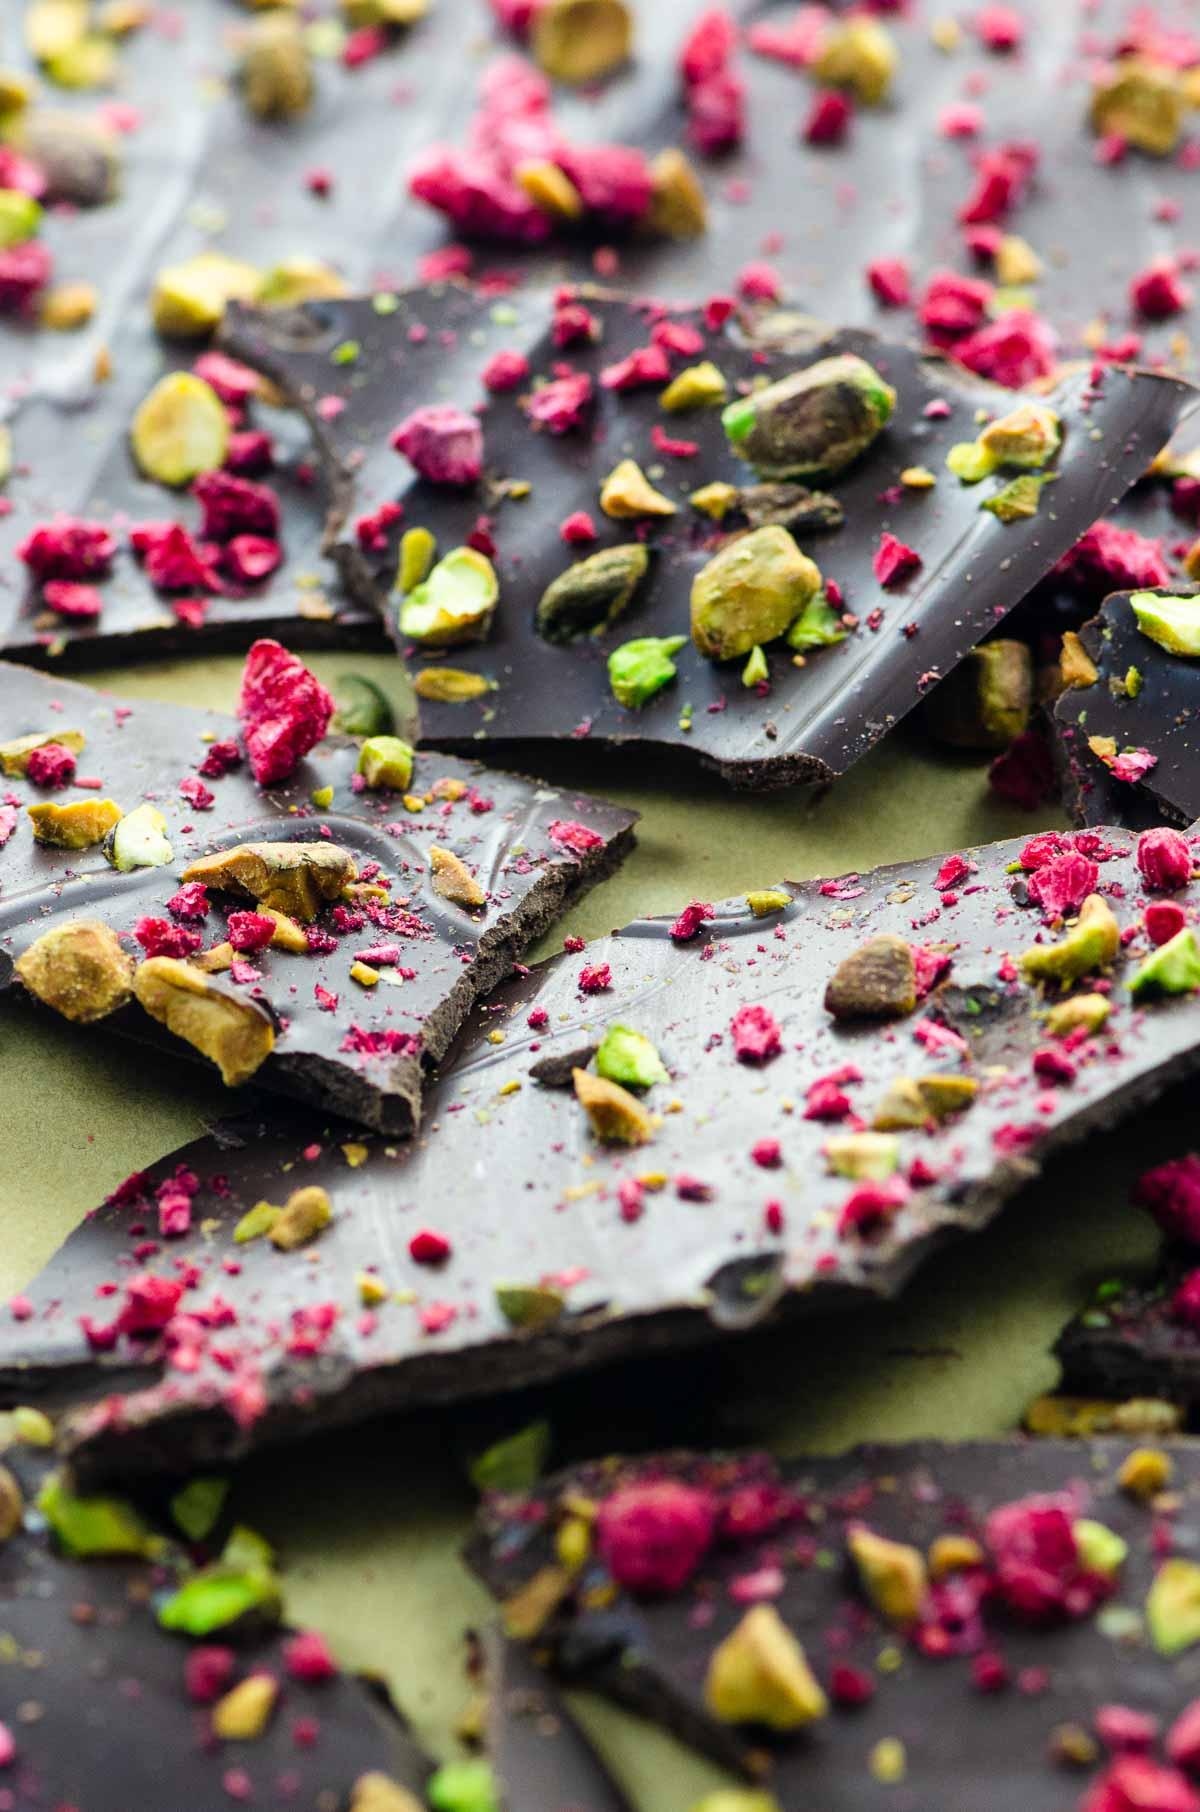 Shards of dark chocolate bark